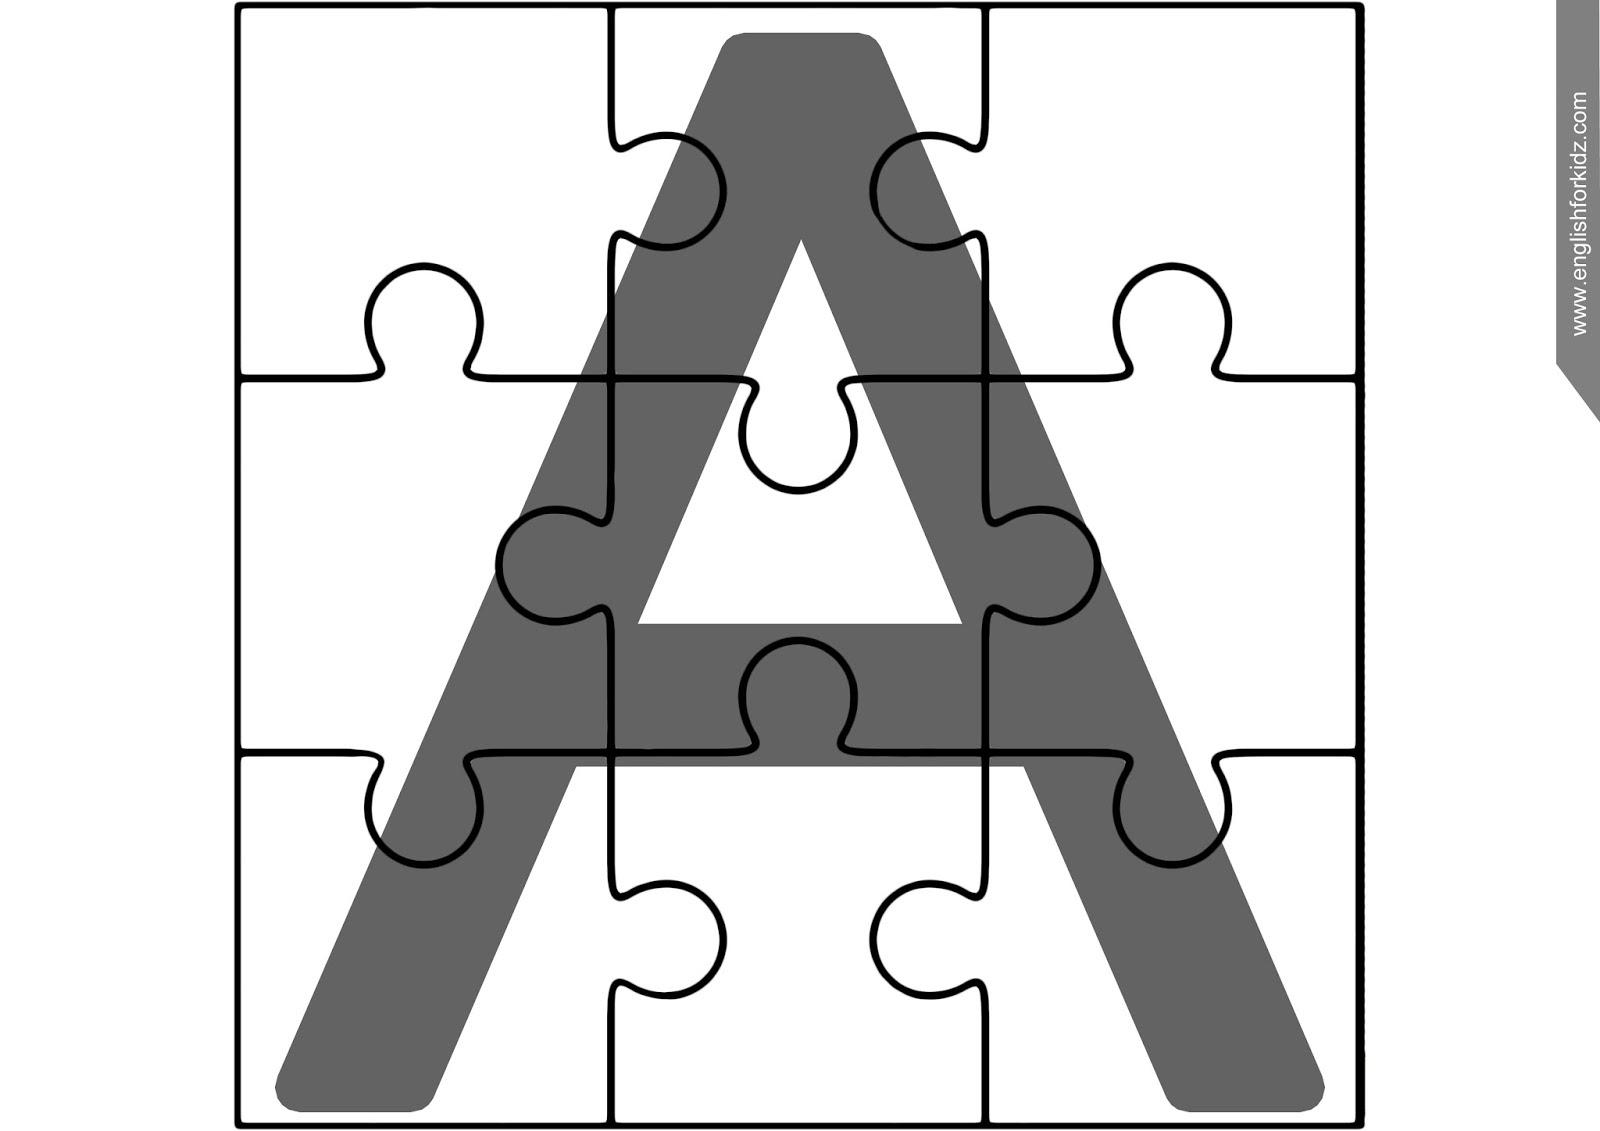 Printable Abc Puzzles - Printable Abc Puzzle